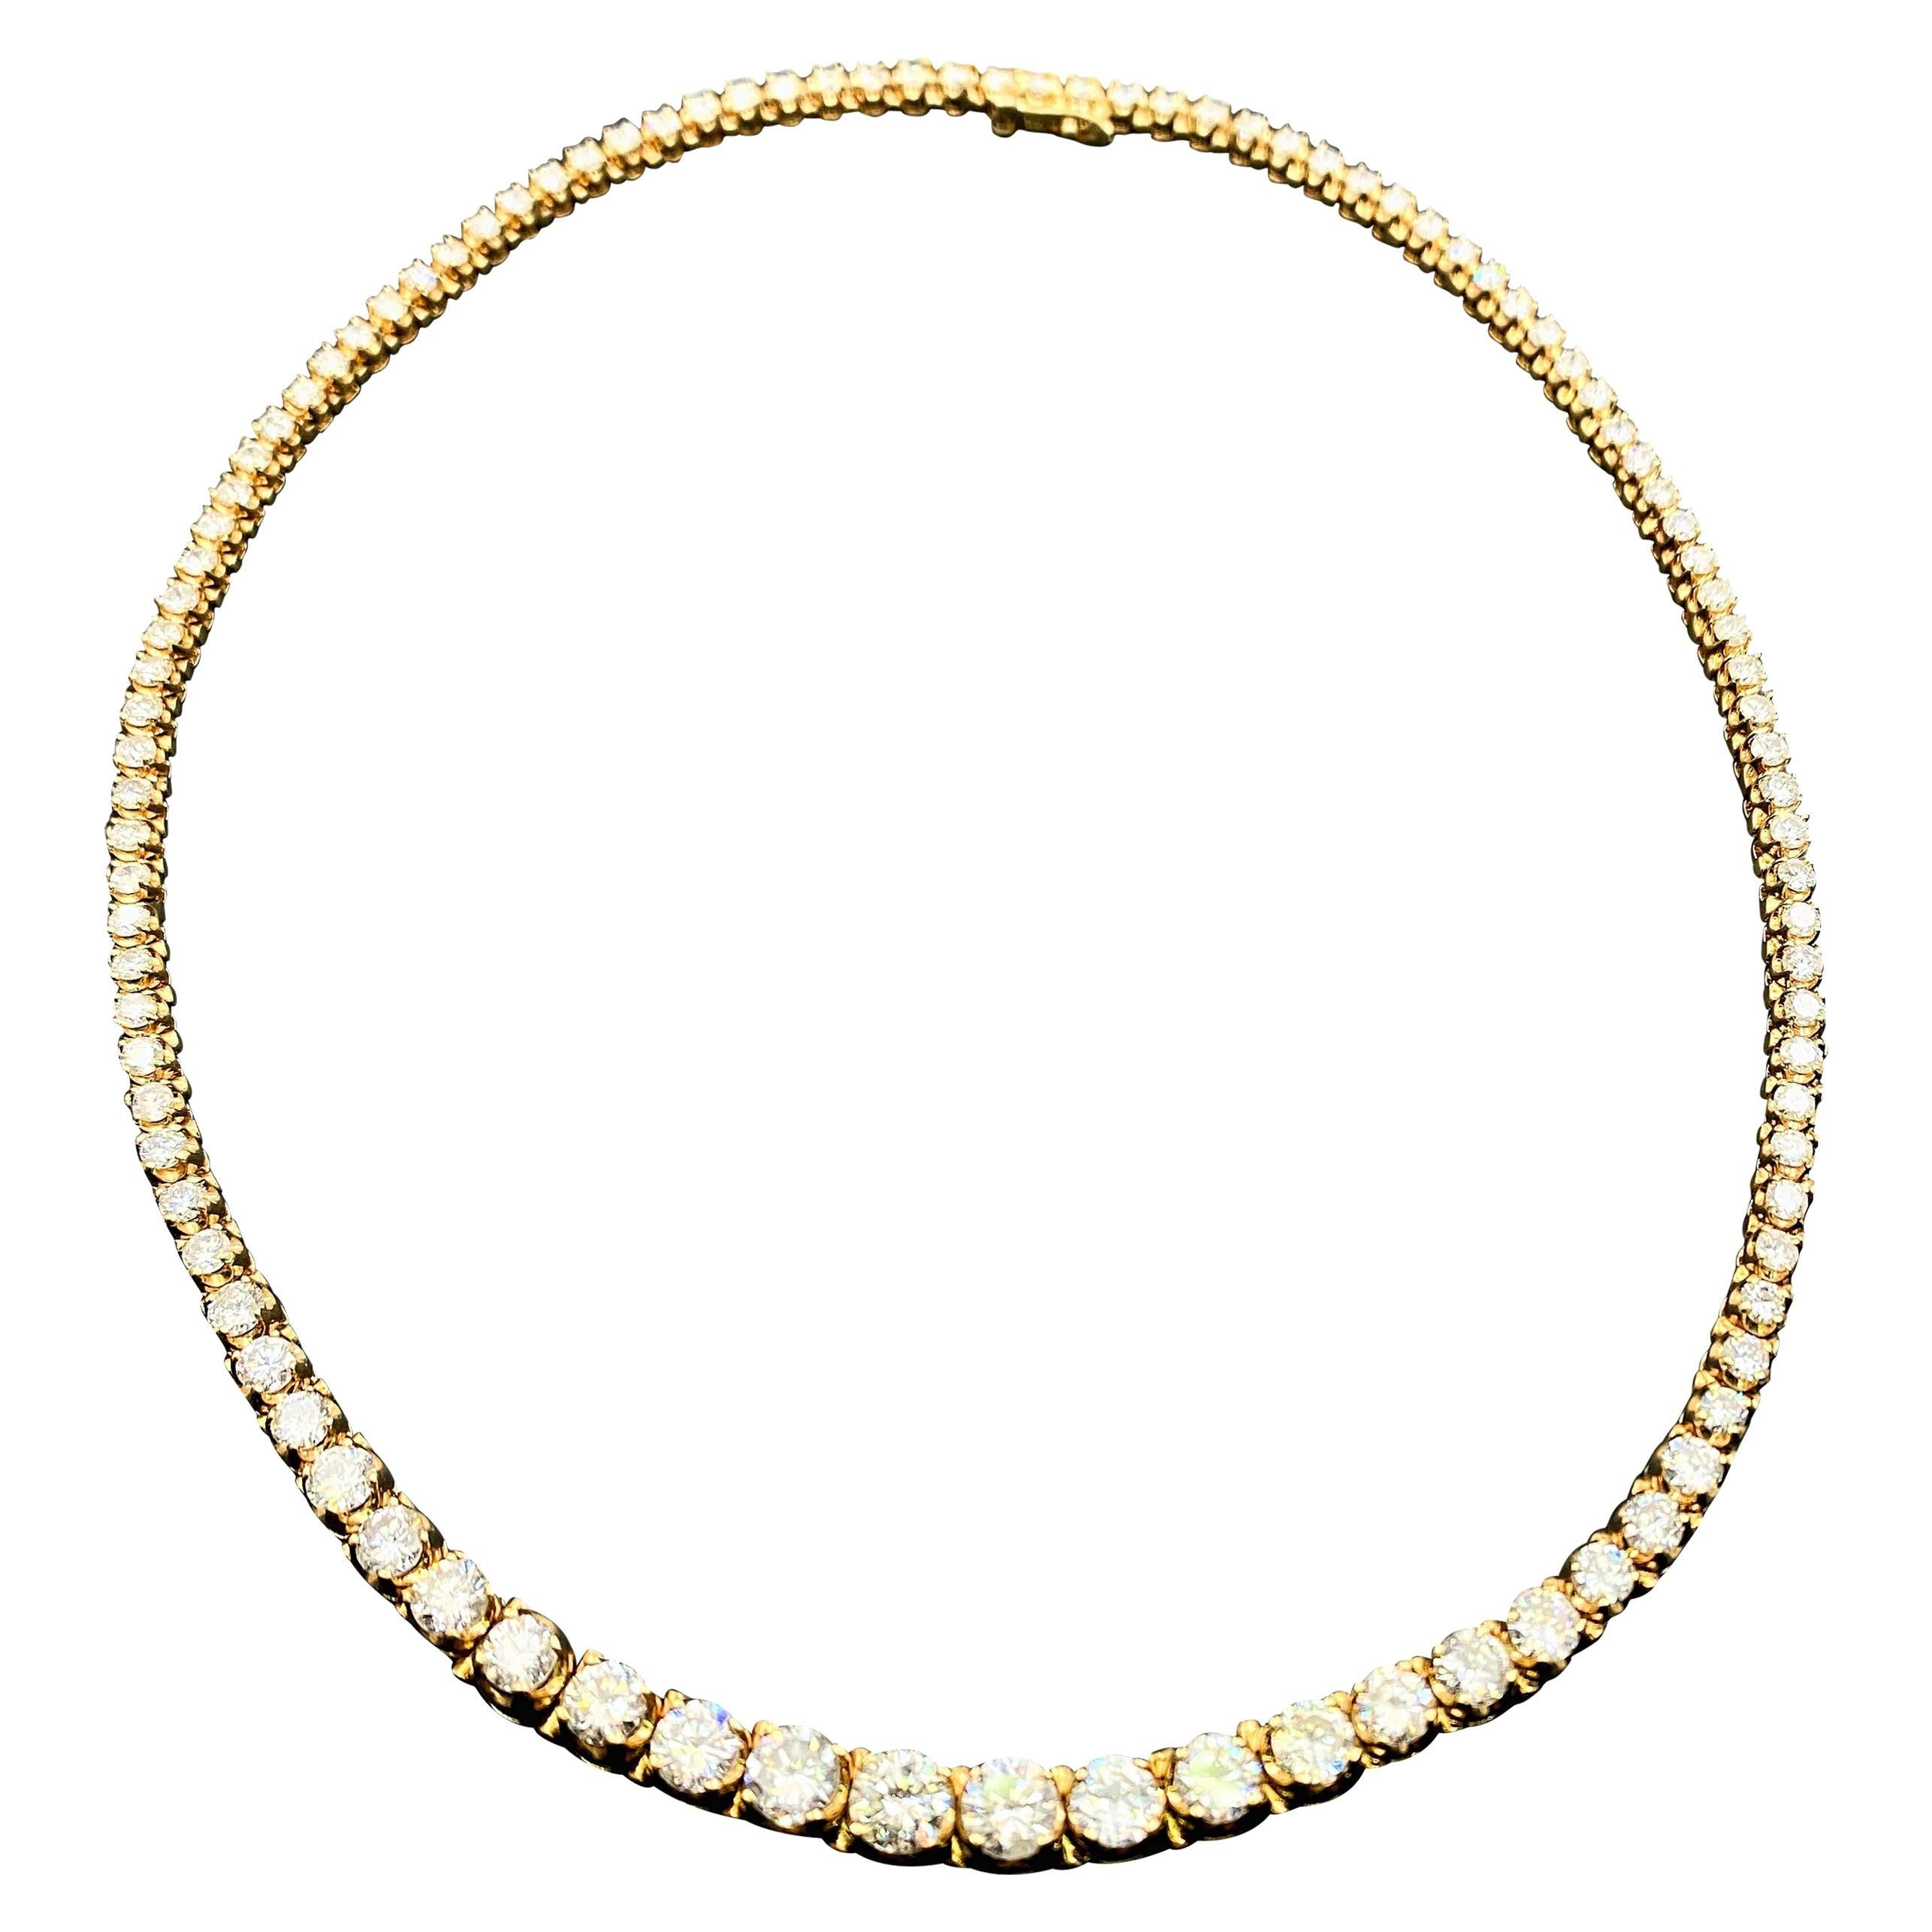 12.00 Carat Round Diamond Riviera Necklace 14 Karat Yellow Gold